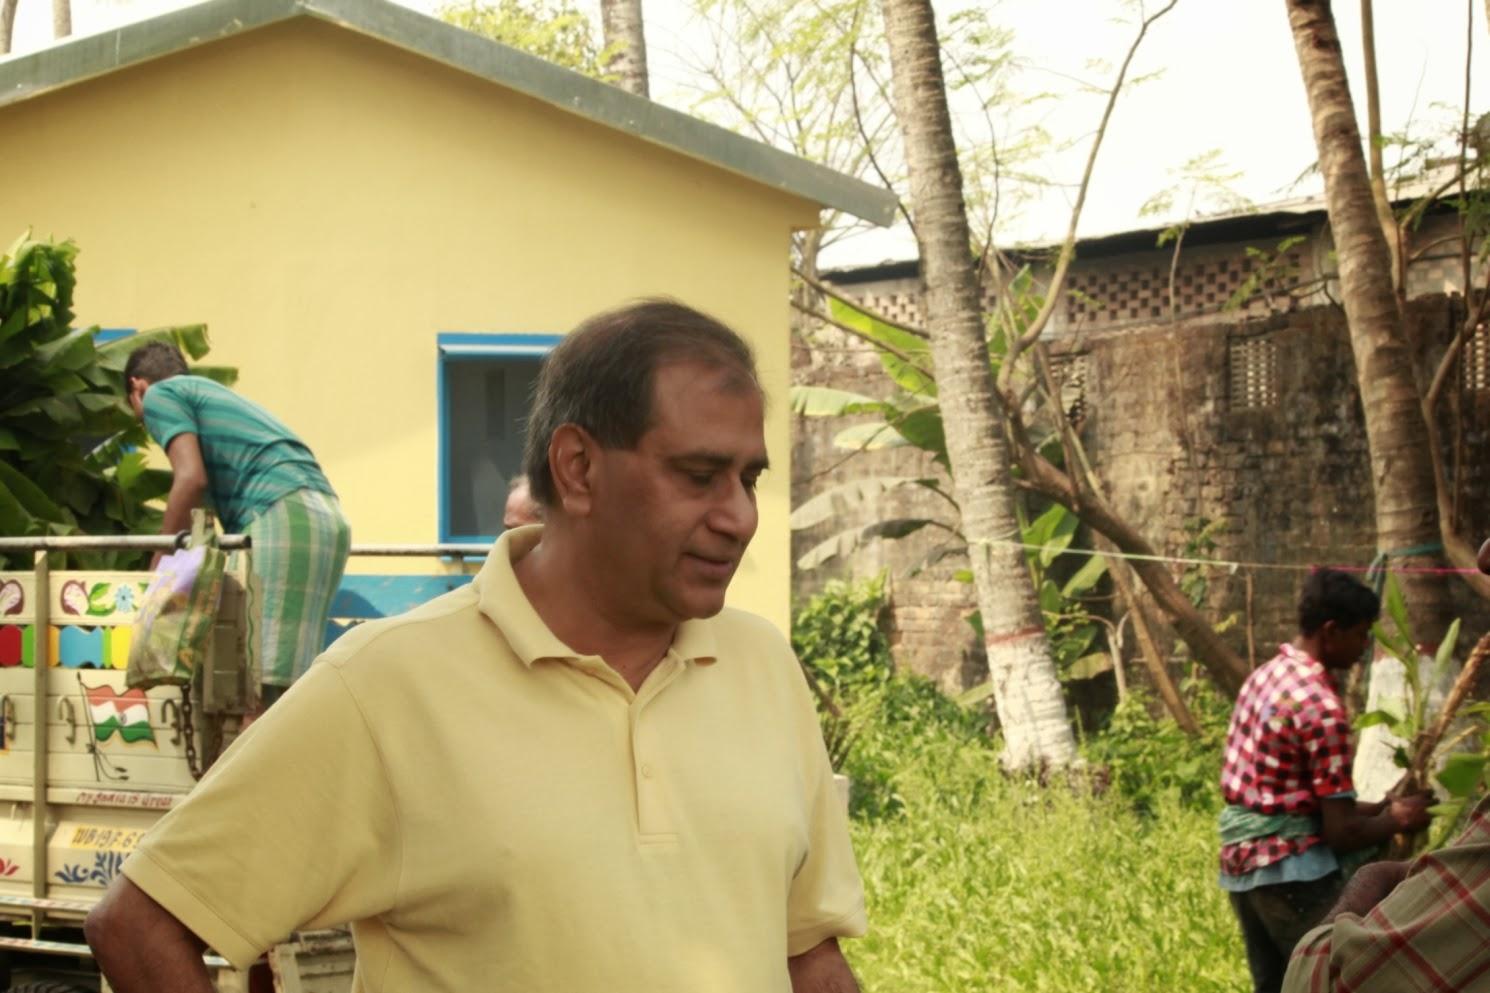 Sandip Bhatia planting a Guava tree at SPCI Kolkata India, planted for his wife Vinita Bhatia